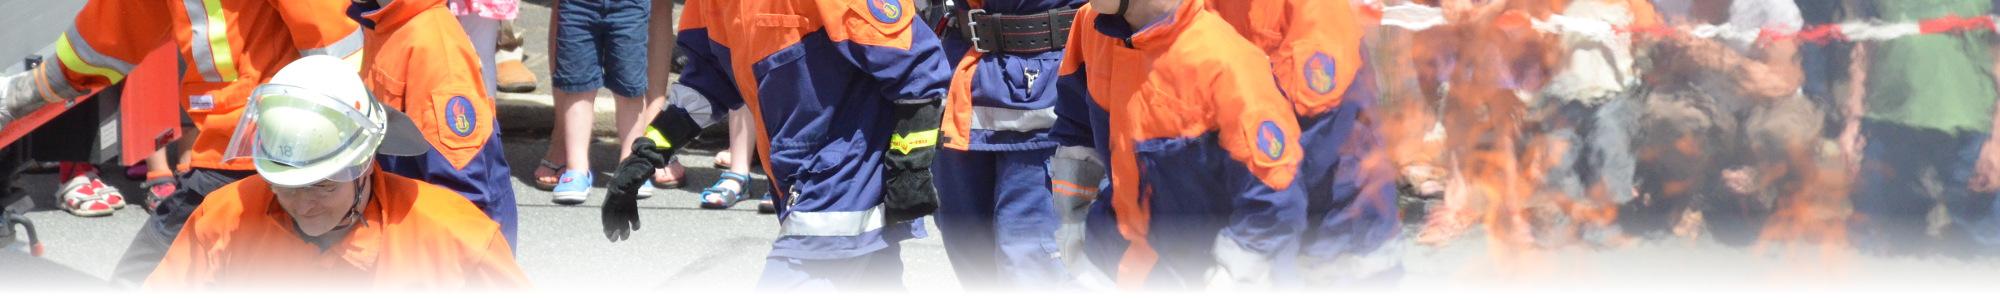 Freiwillige Feuerwehr Laufamholz